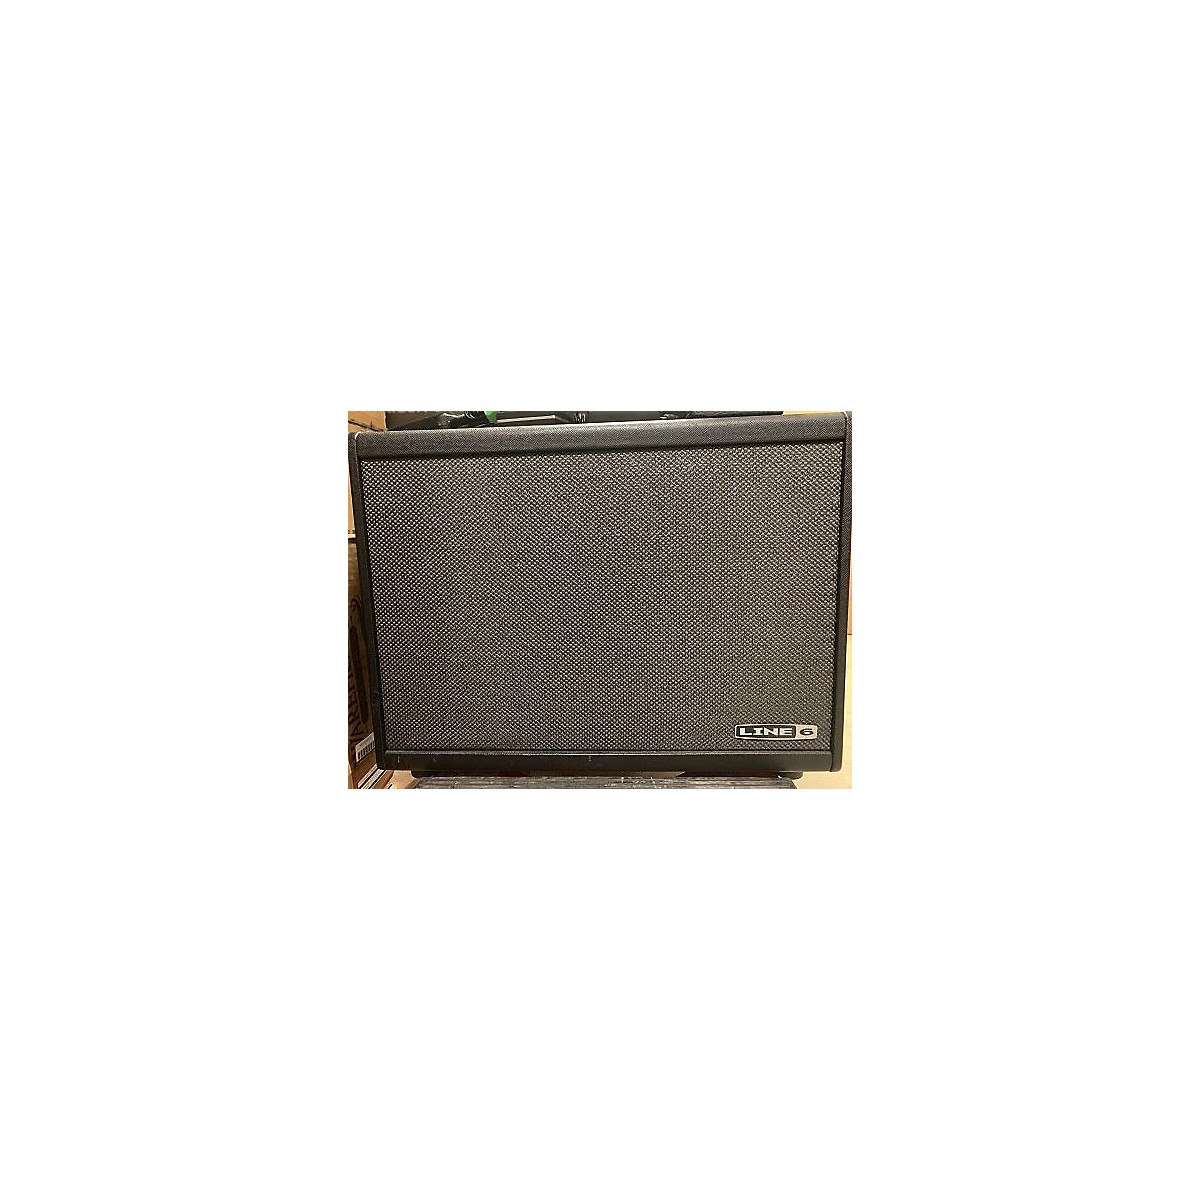 Line 6 Powercab 112 250W 1x12 FRFR Powered Guitar Cabinet